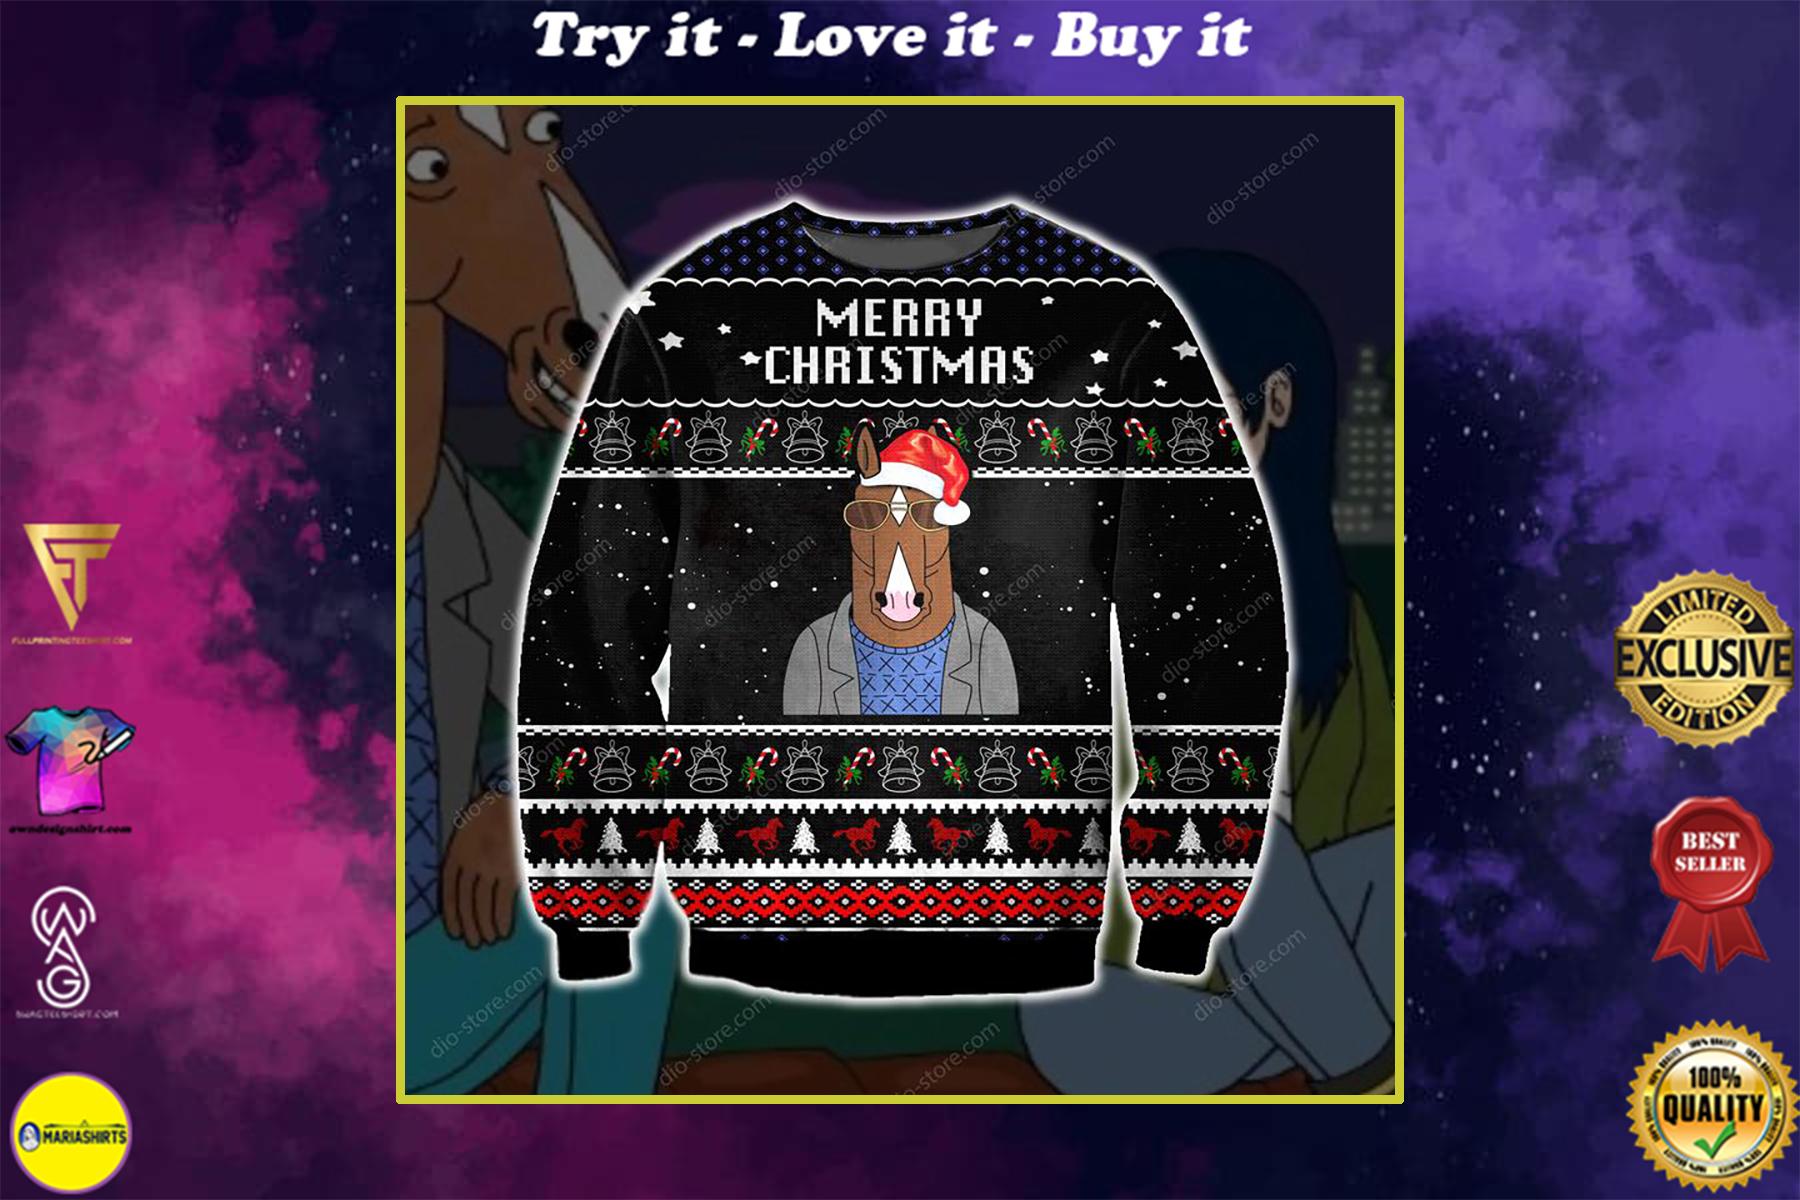 bojack horseman merry christmas ugly christmas sweater